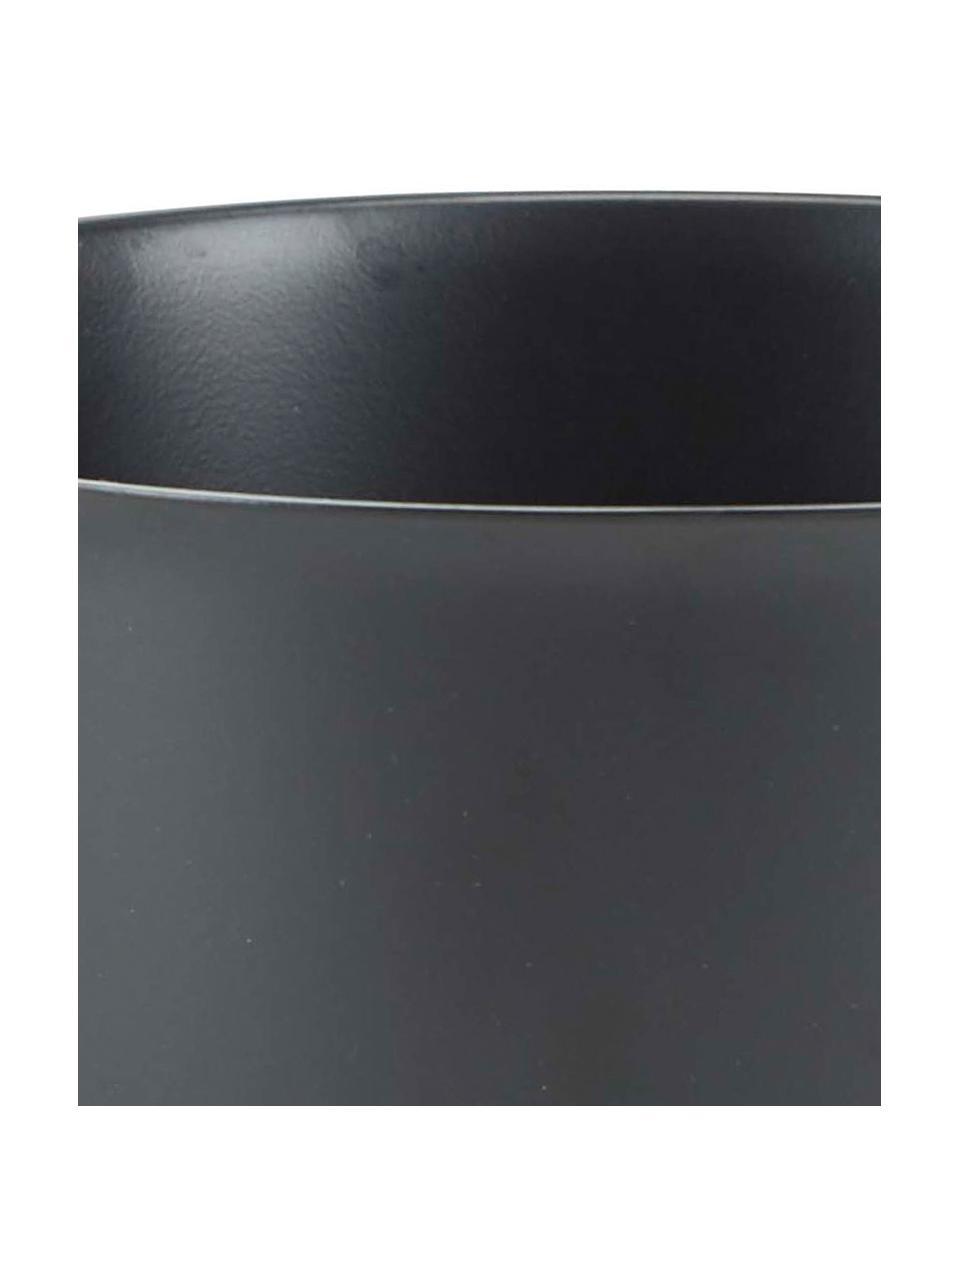 Rührschüssel Mixa in Schwarz, Edelstahl, beschichtet, Schwarz, Ø 22 x H 14 cm